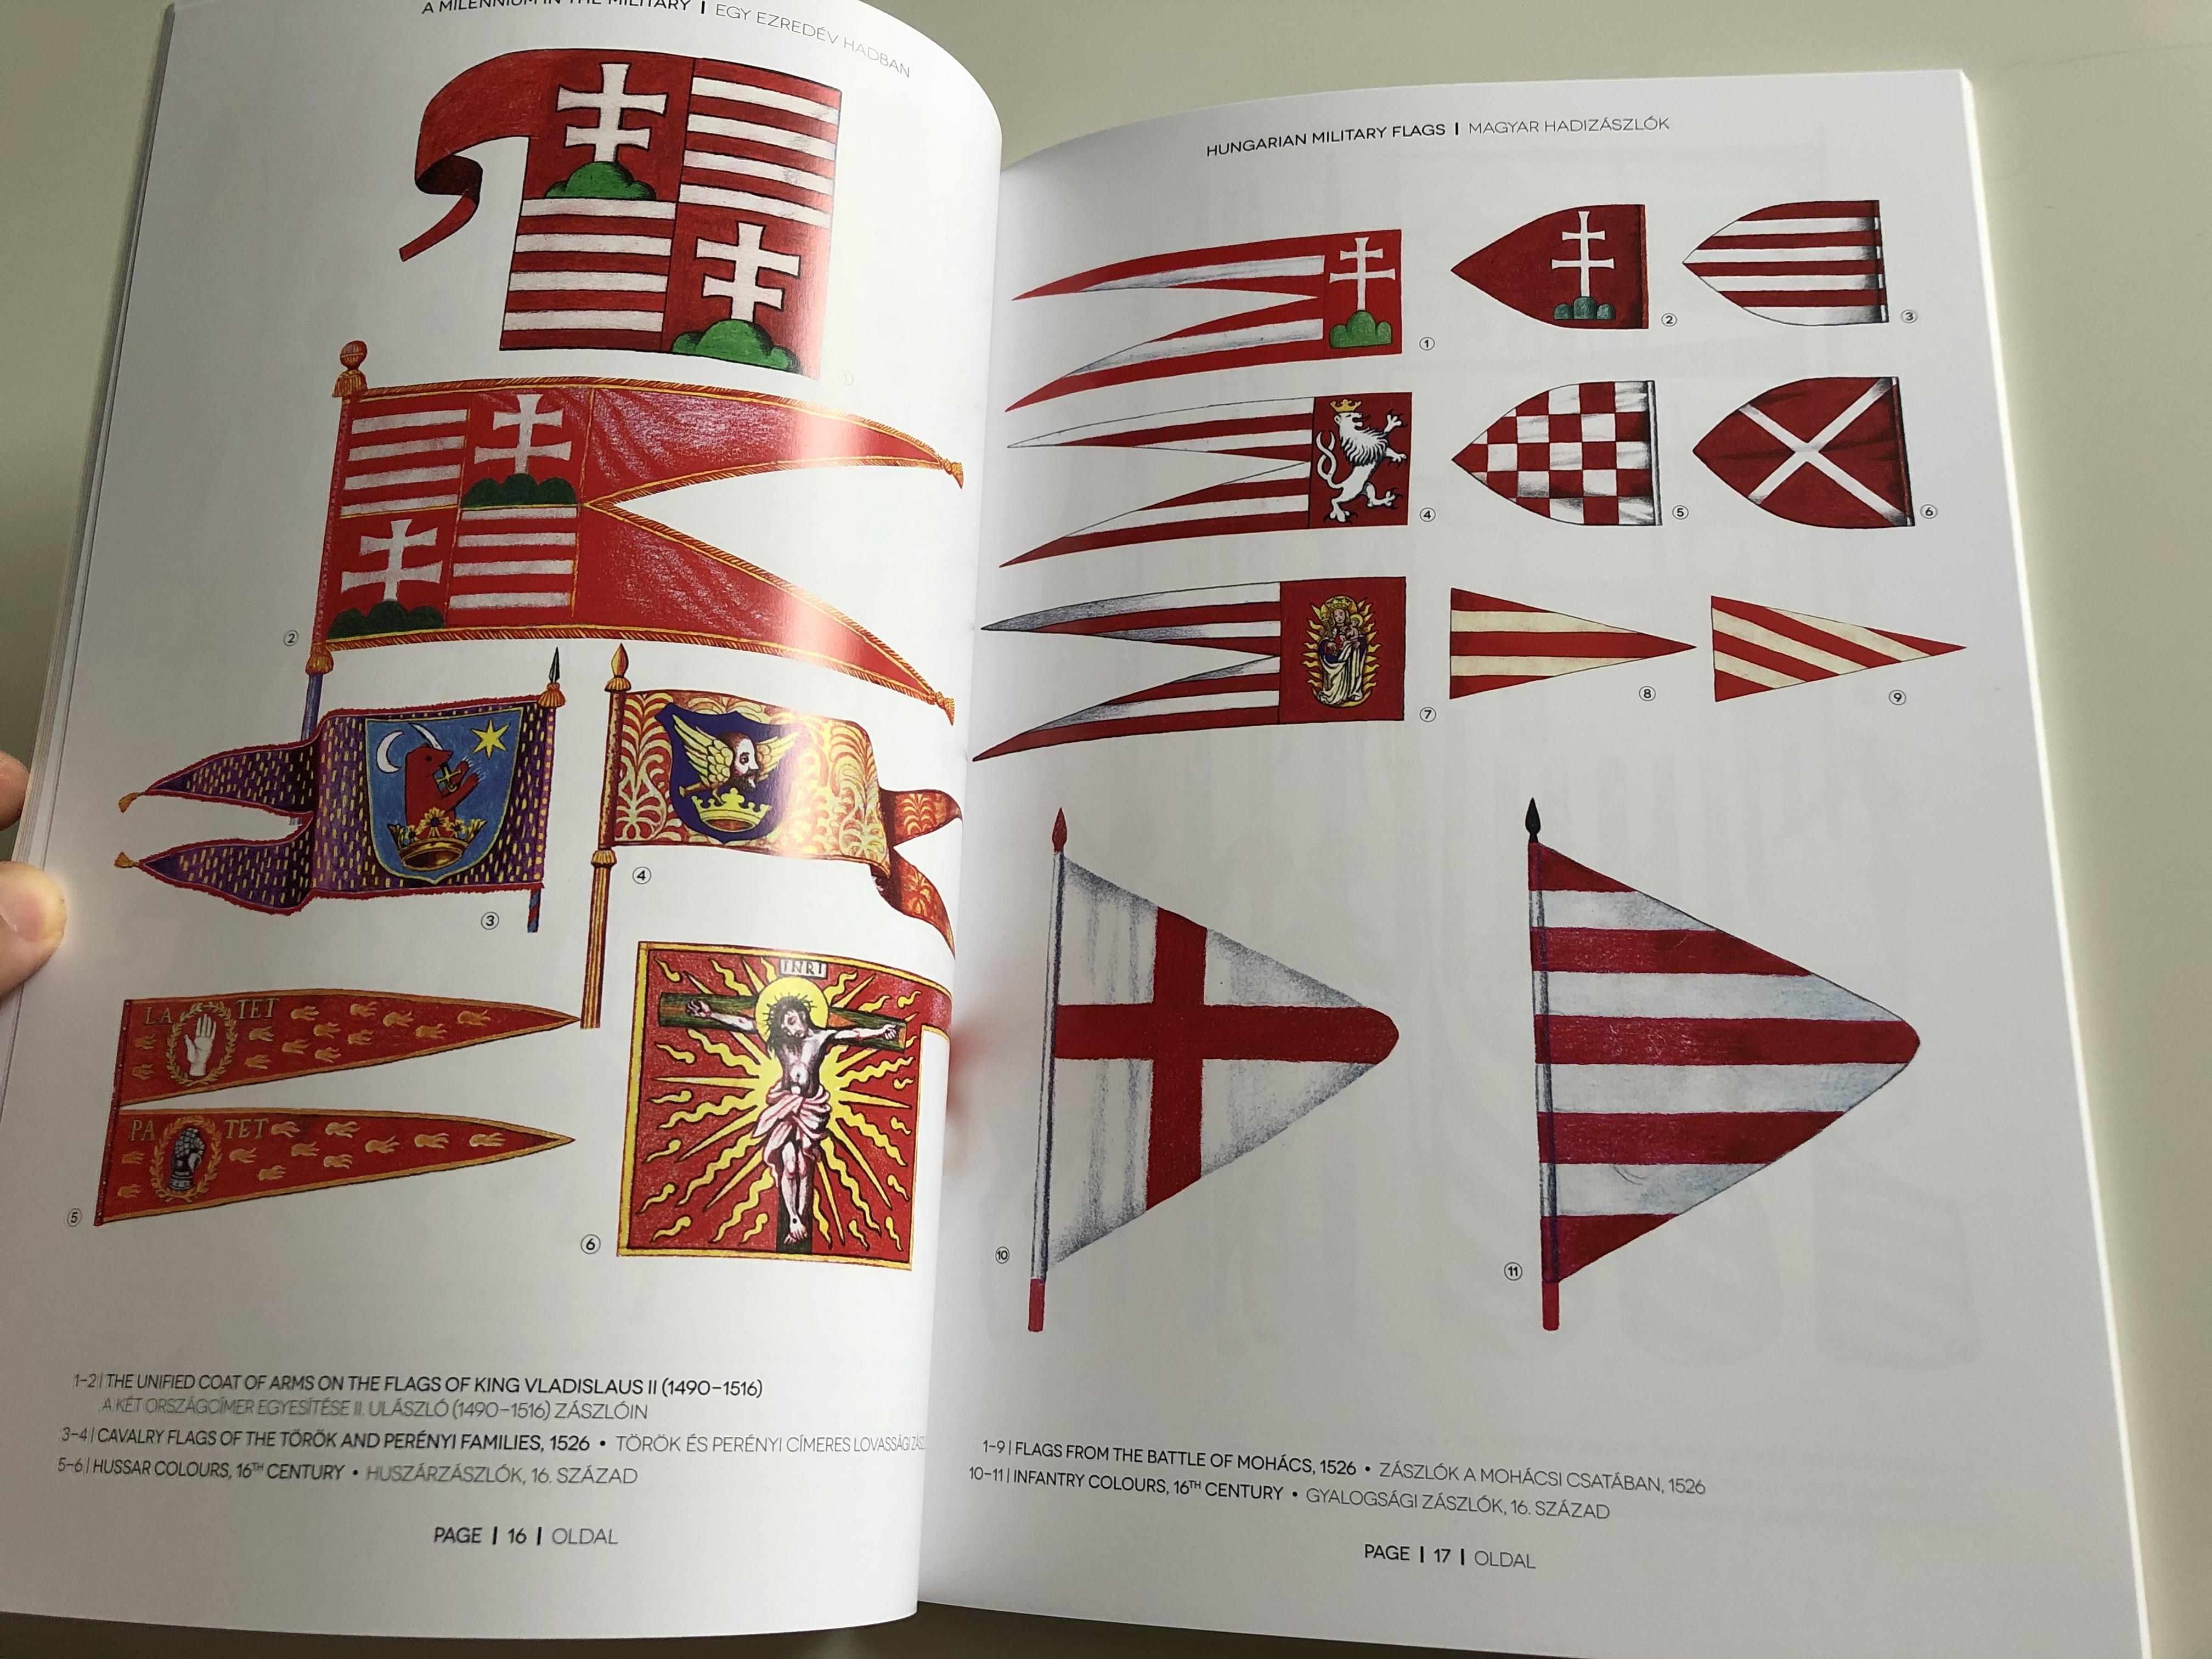 hungarian-military-flags-by-gy-z-somogyi-magyar-hadiz-szl-k-a-millennium-in-the-military-egy-ezred-v-hadban-paperback-2014-hm-zr-nyi-6-.jpg